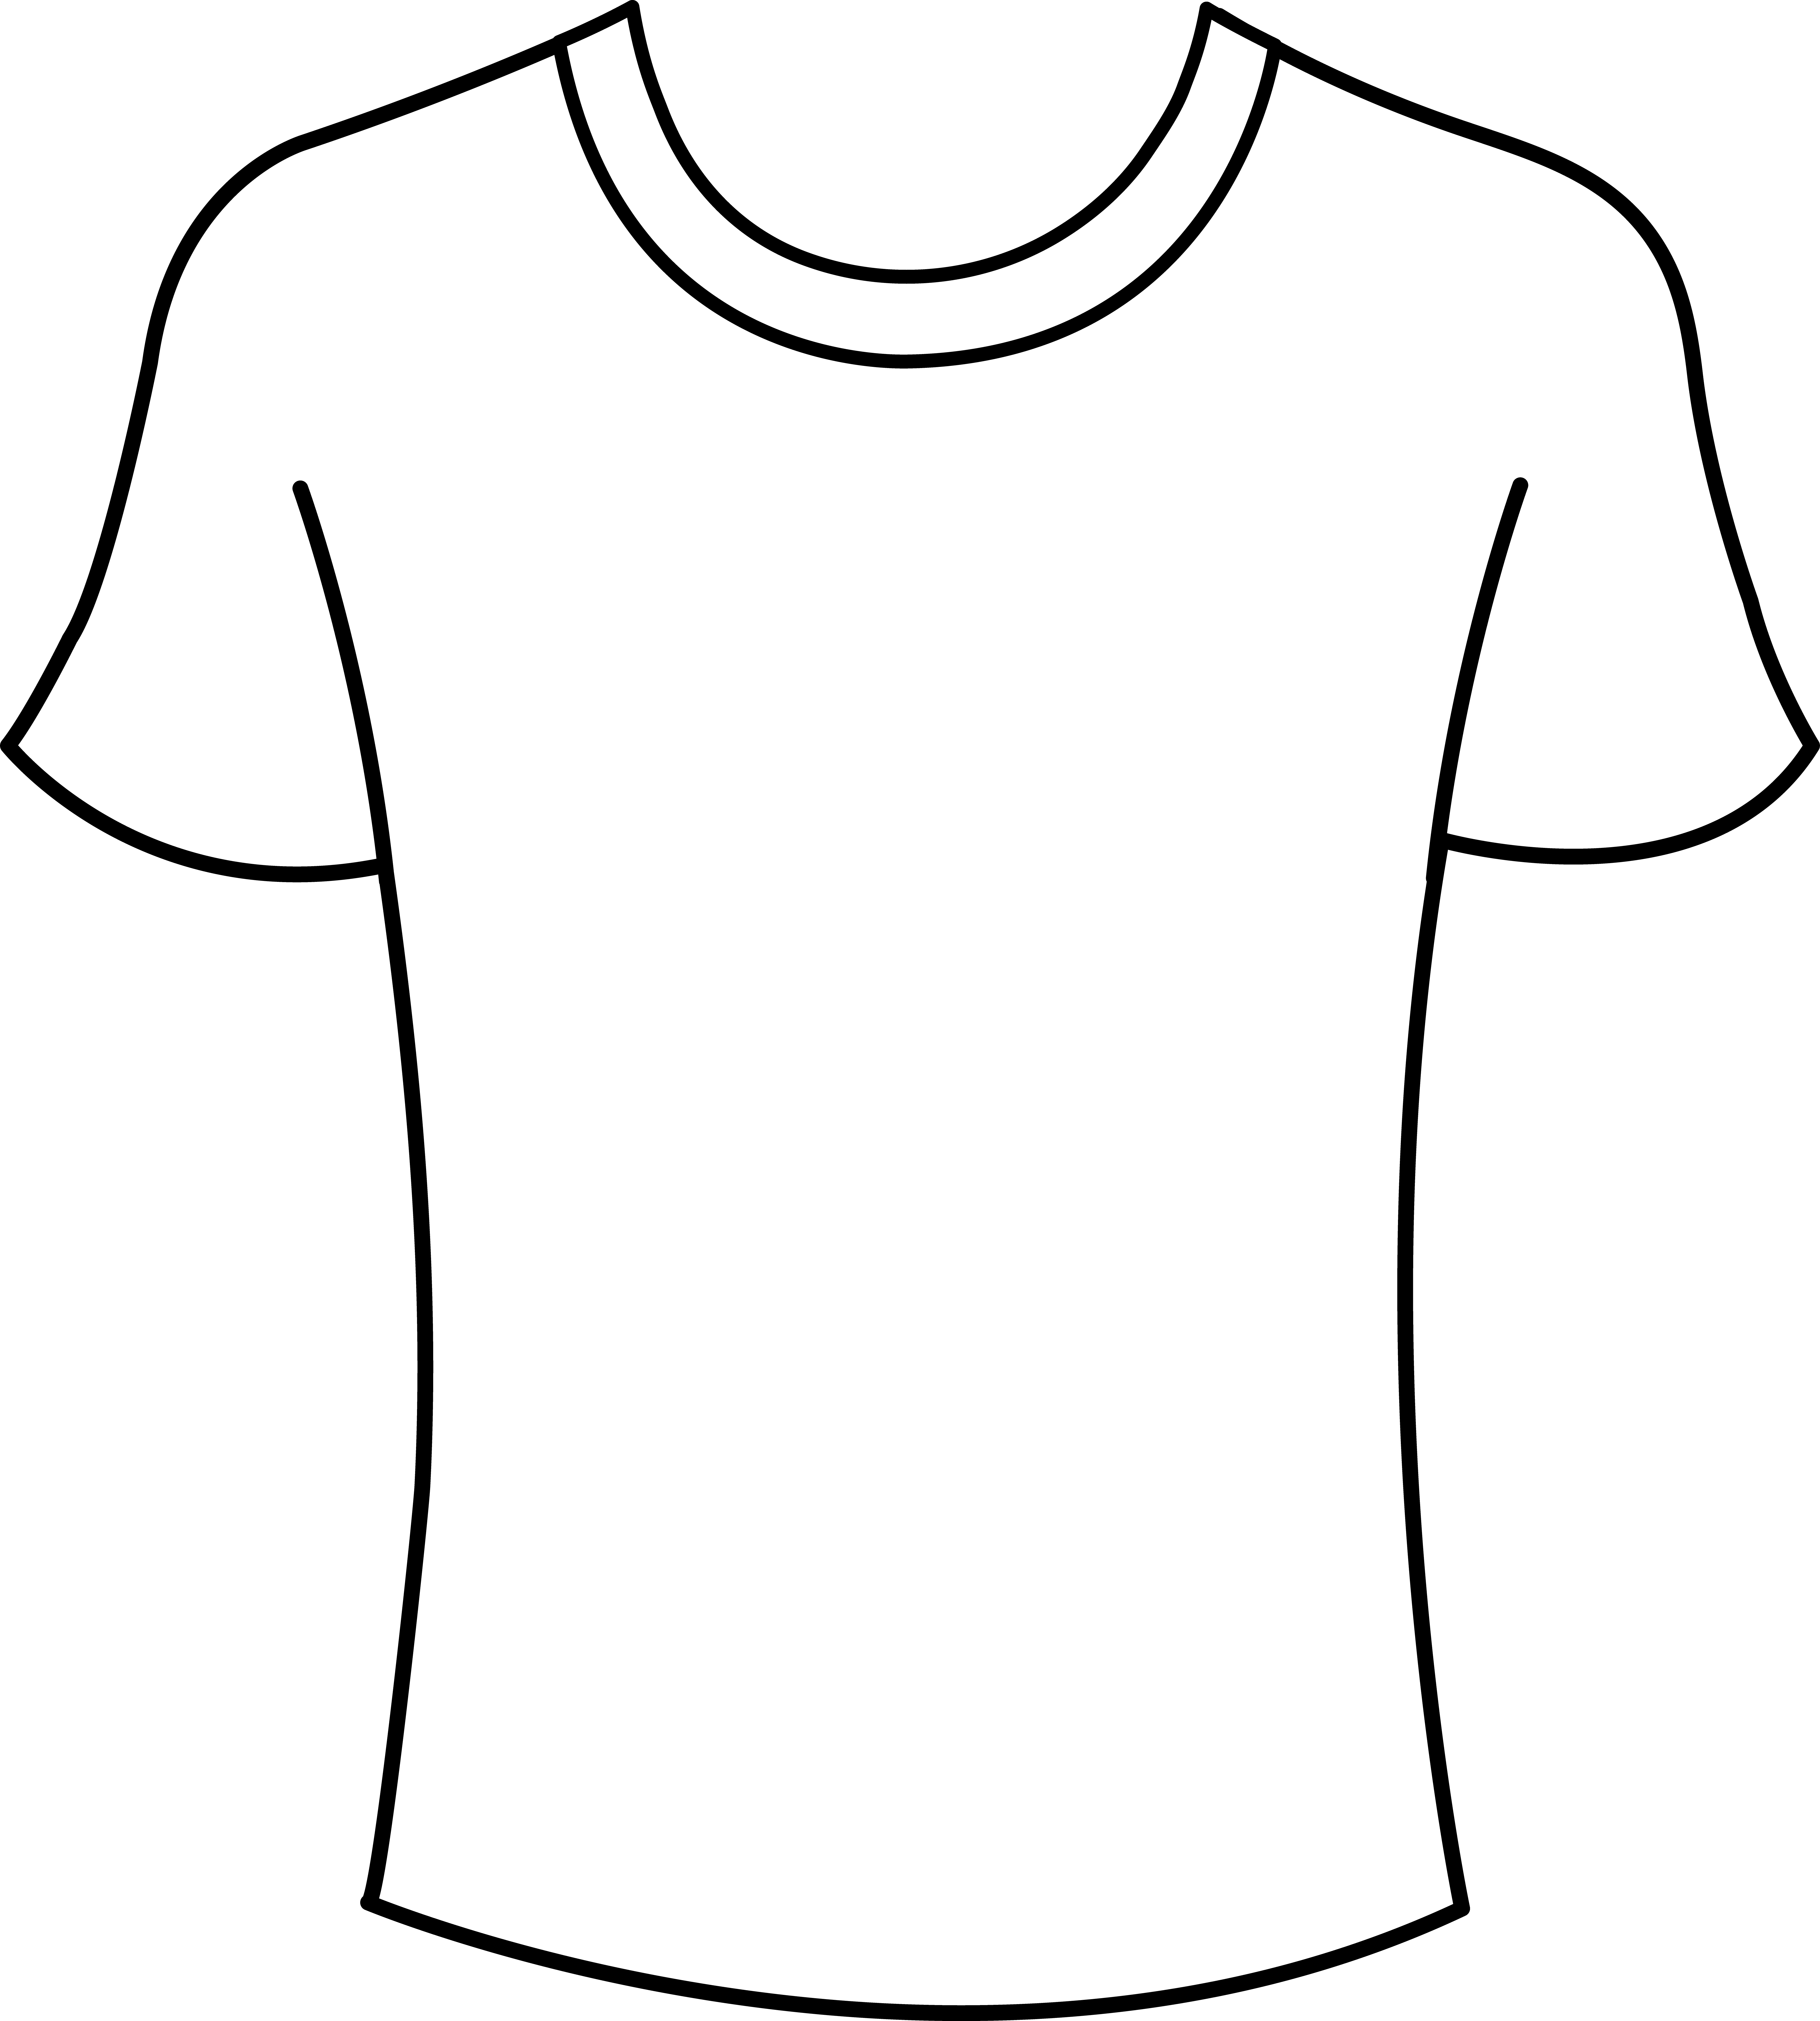 shirt Clip Art Free - Cliparts.co